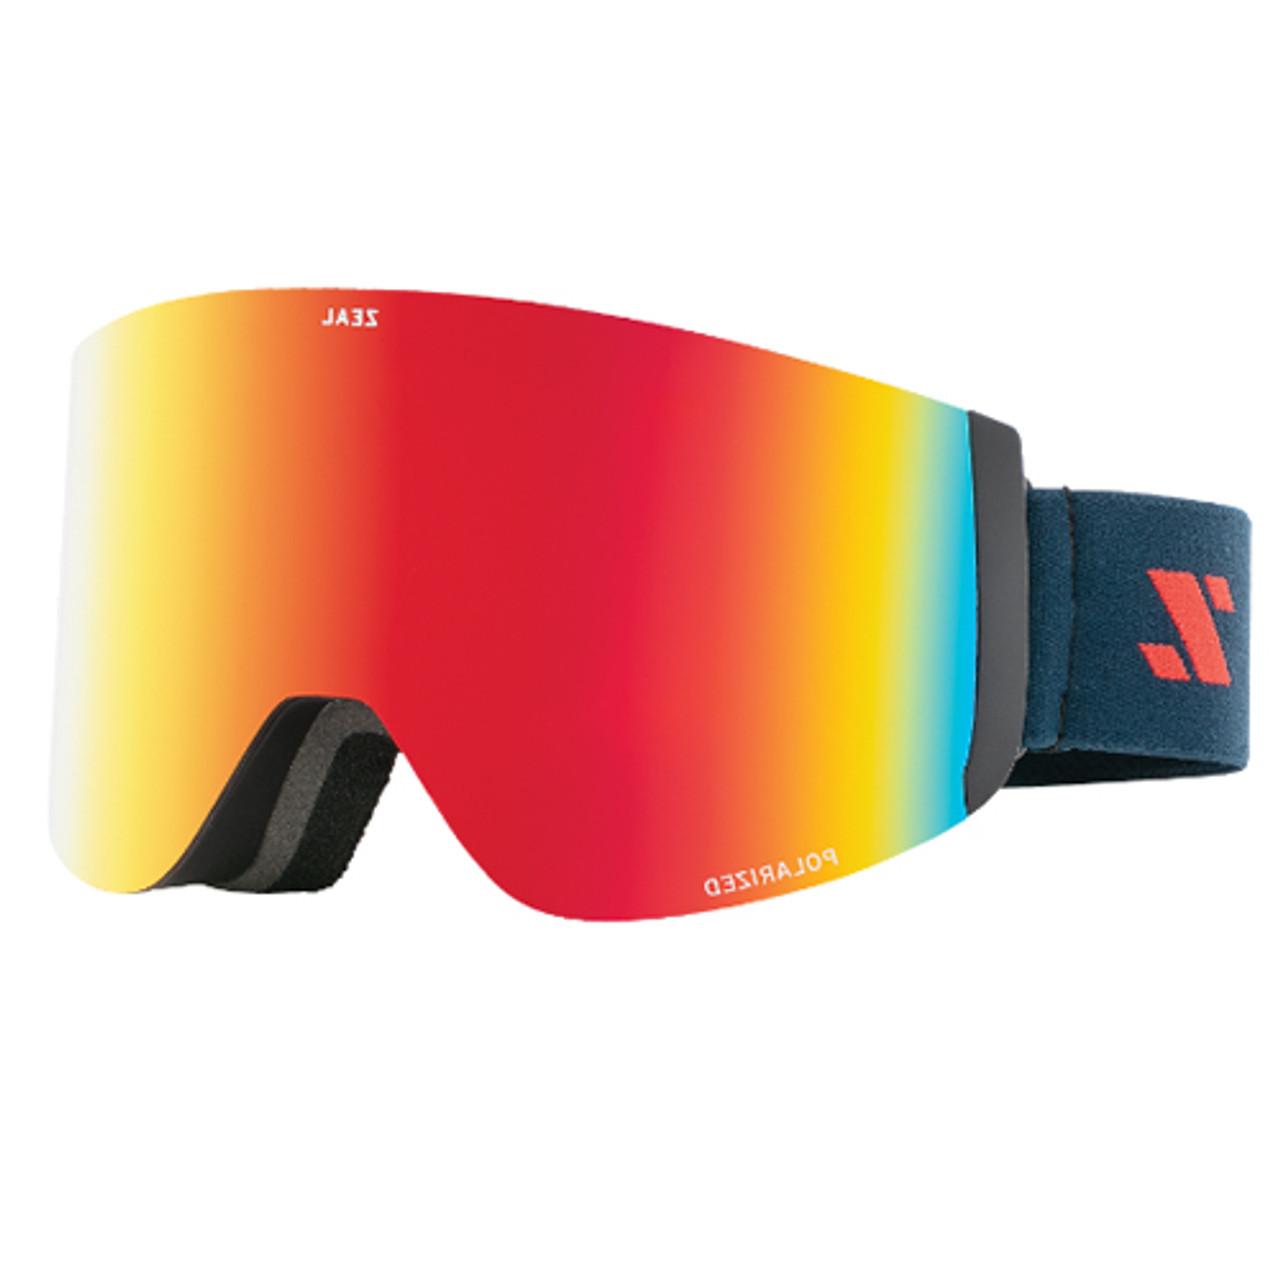 Lens for Zeal Hatchet Ski Goggles